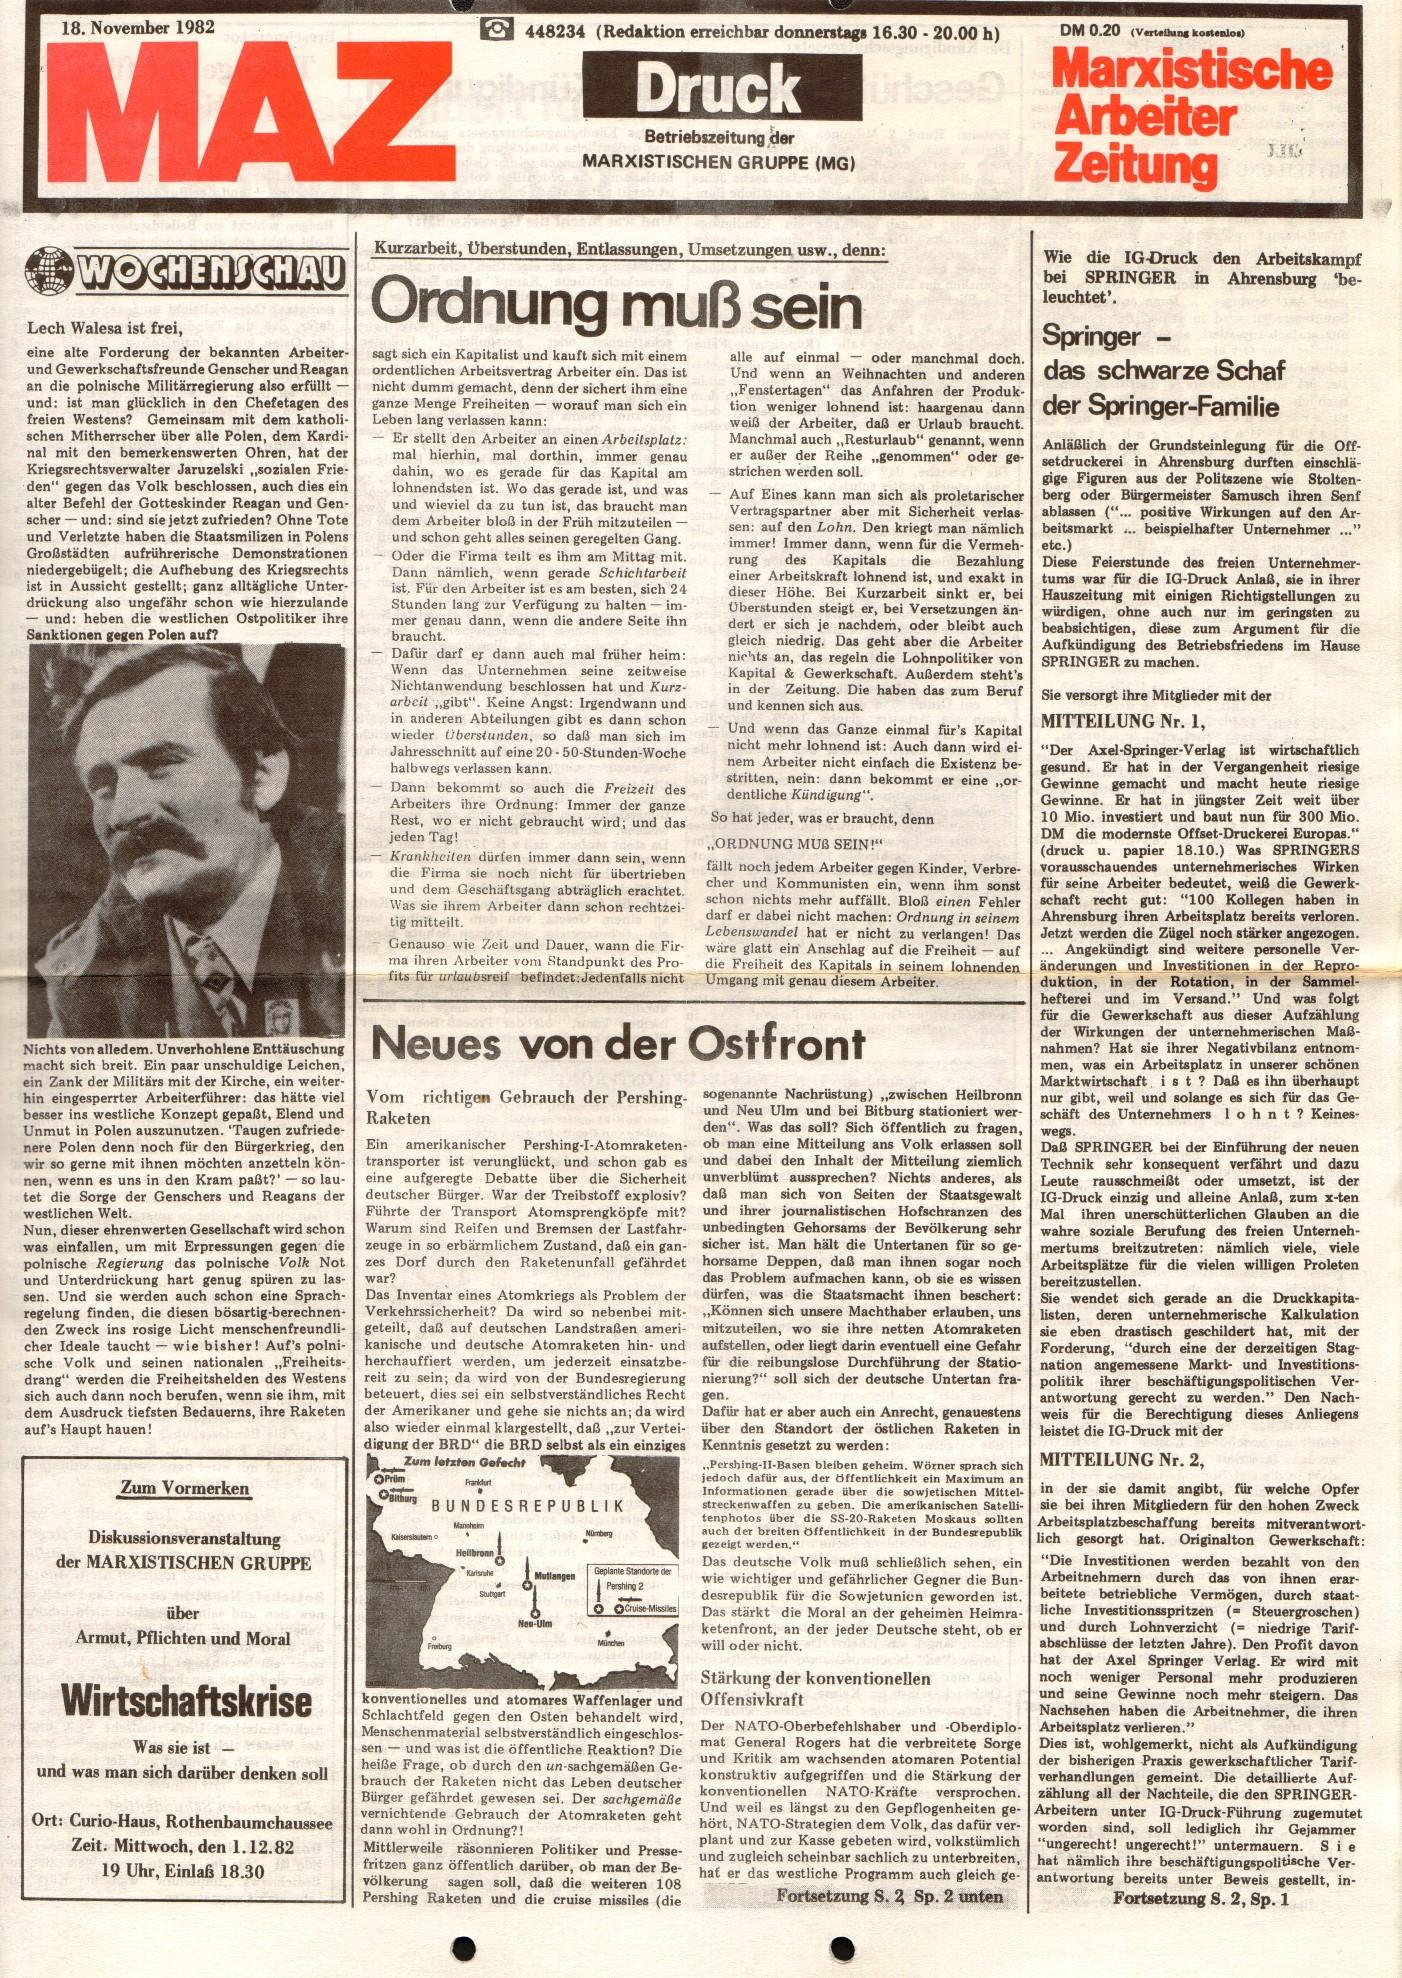 Hamburg_MG_MAZ_Druck_19821118_01